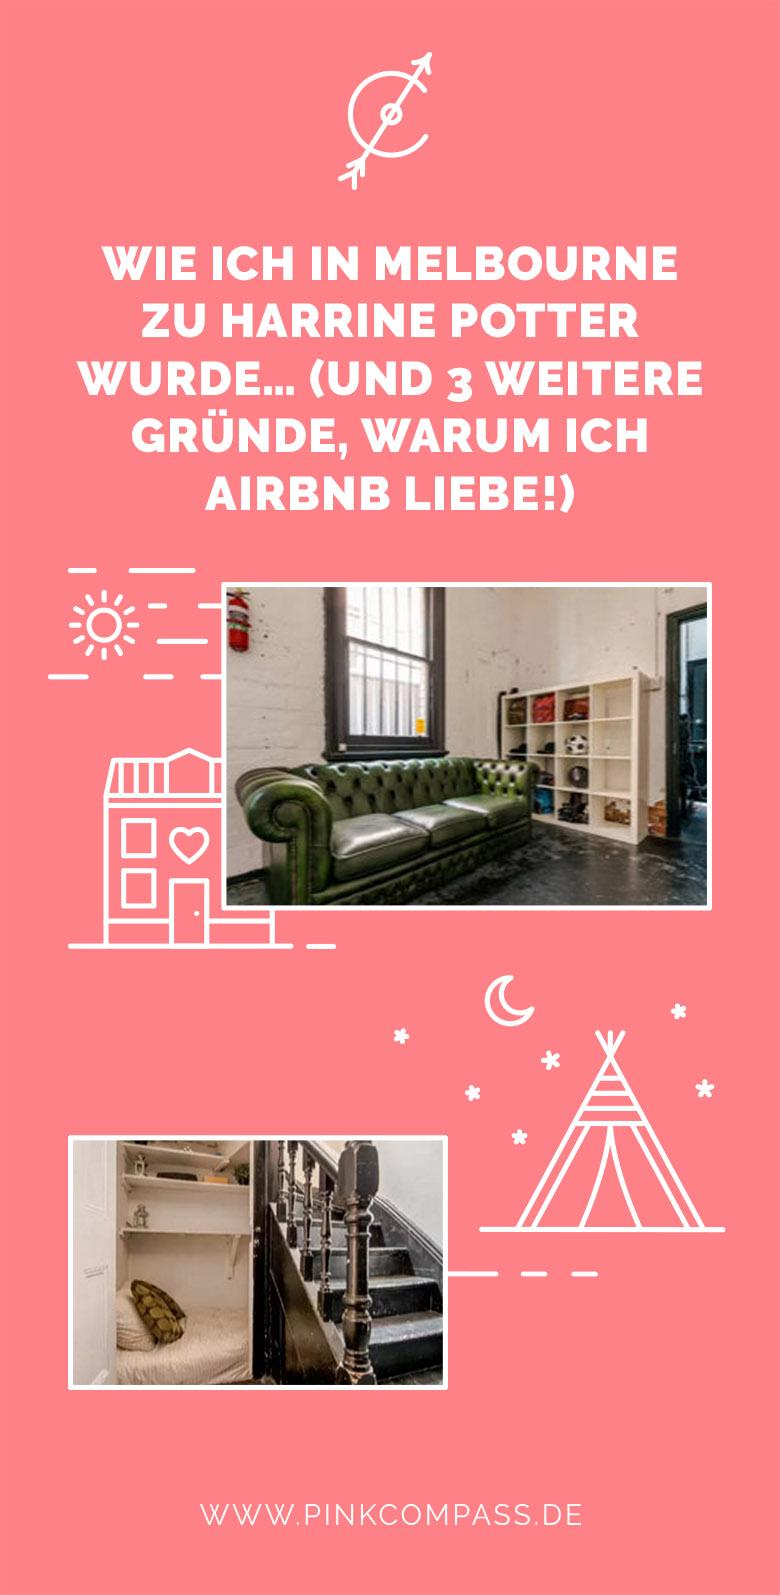 airbnb erfahrung in melbourne einmal wie harry potter schlafen. Black Bedroom Furniture Sets. Home Design Ideas